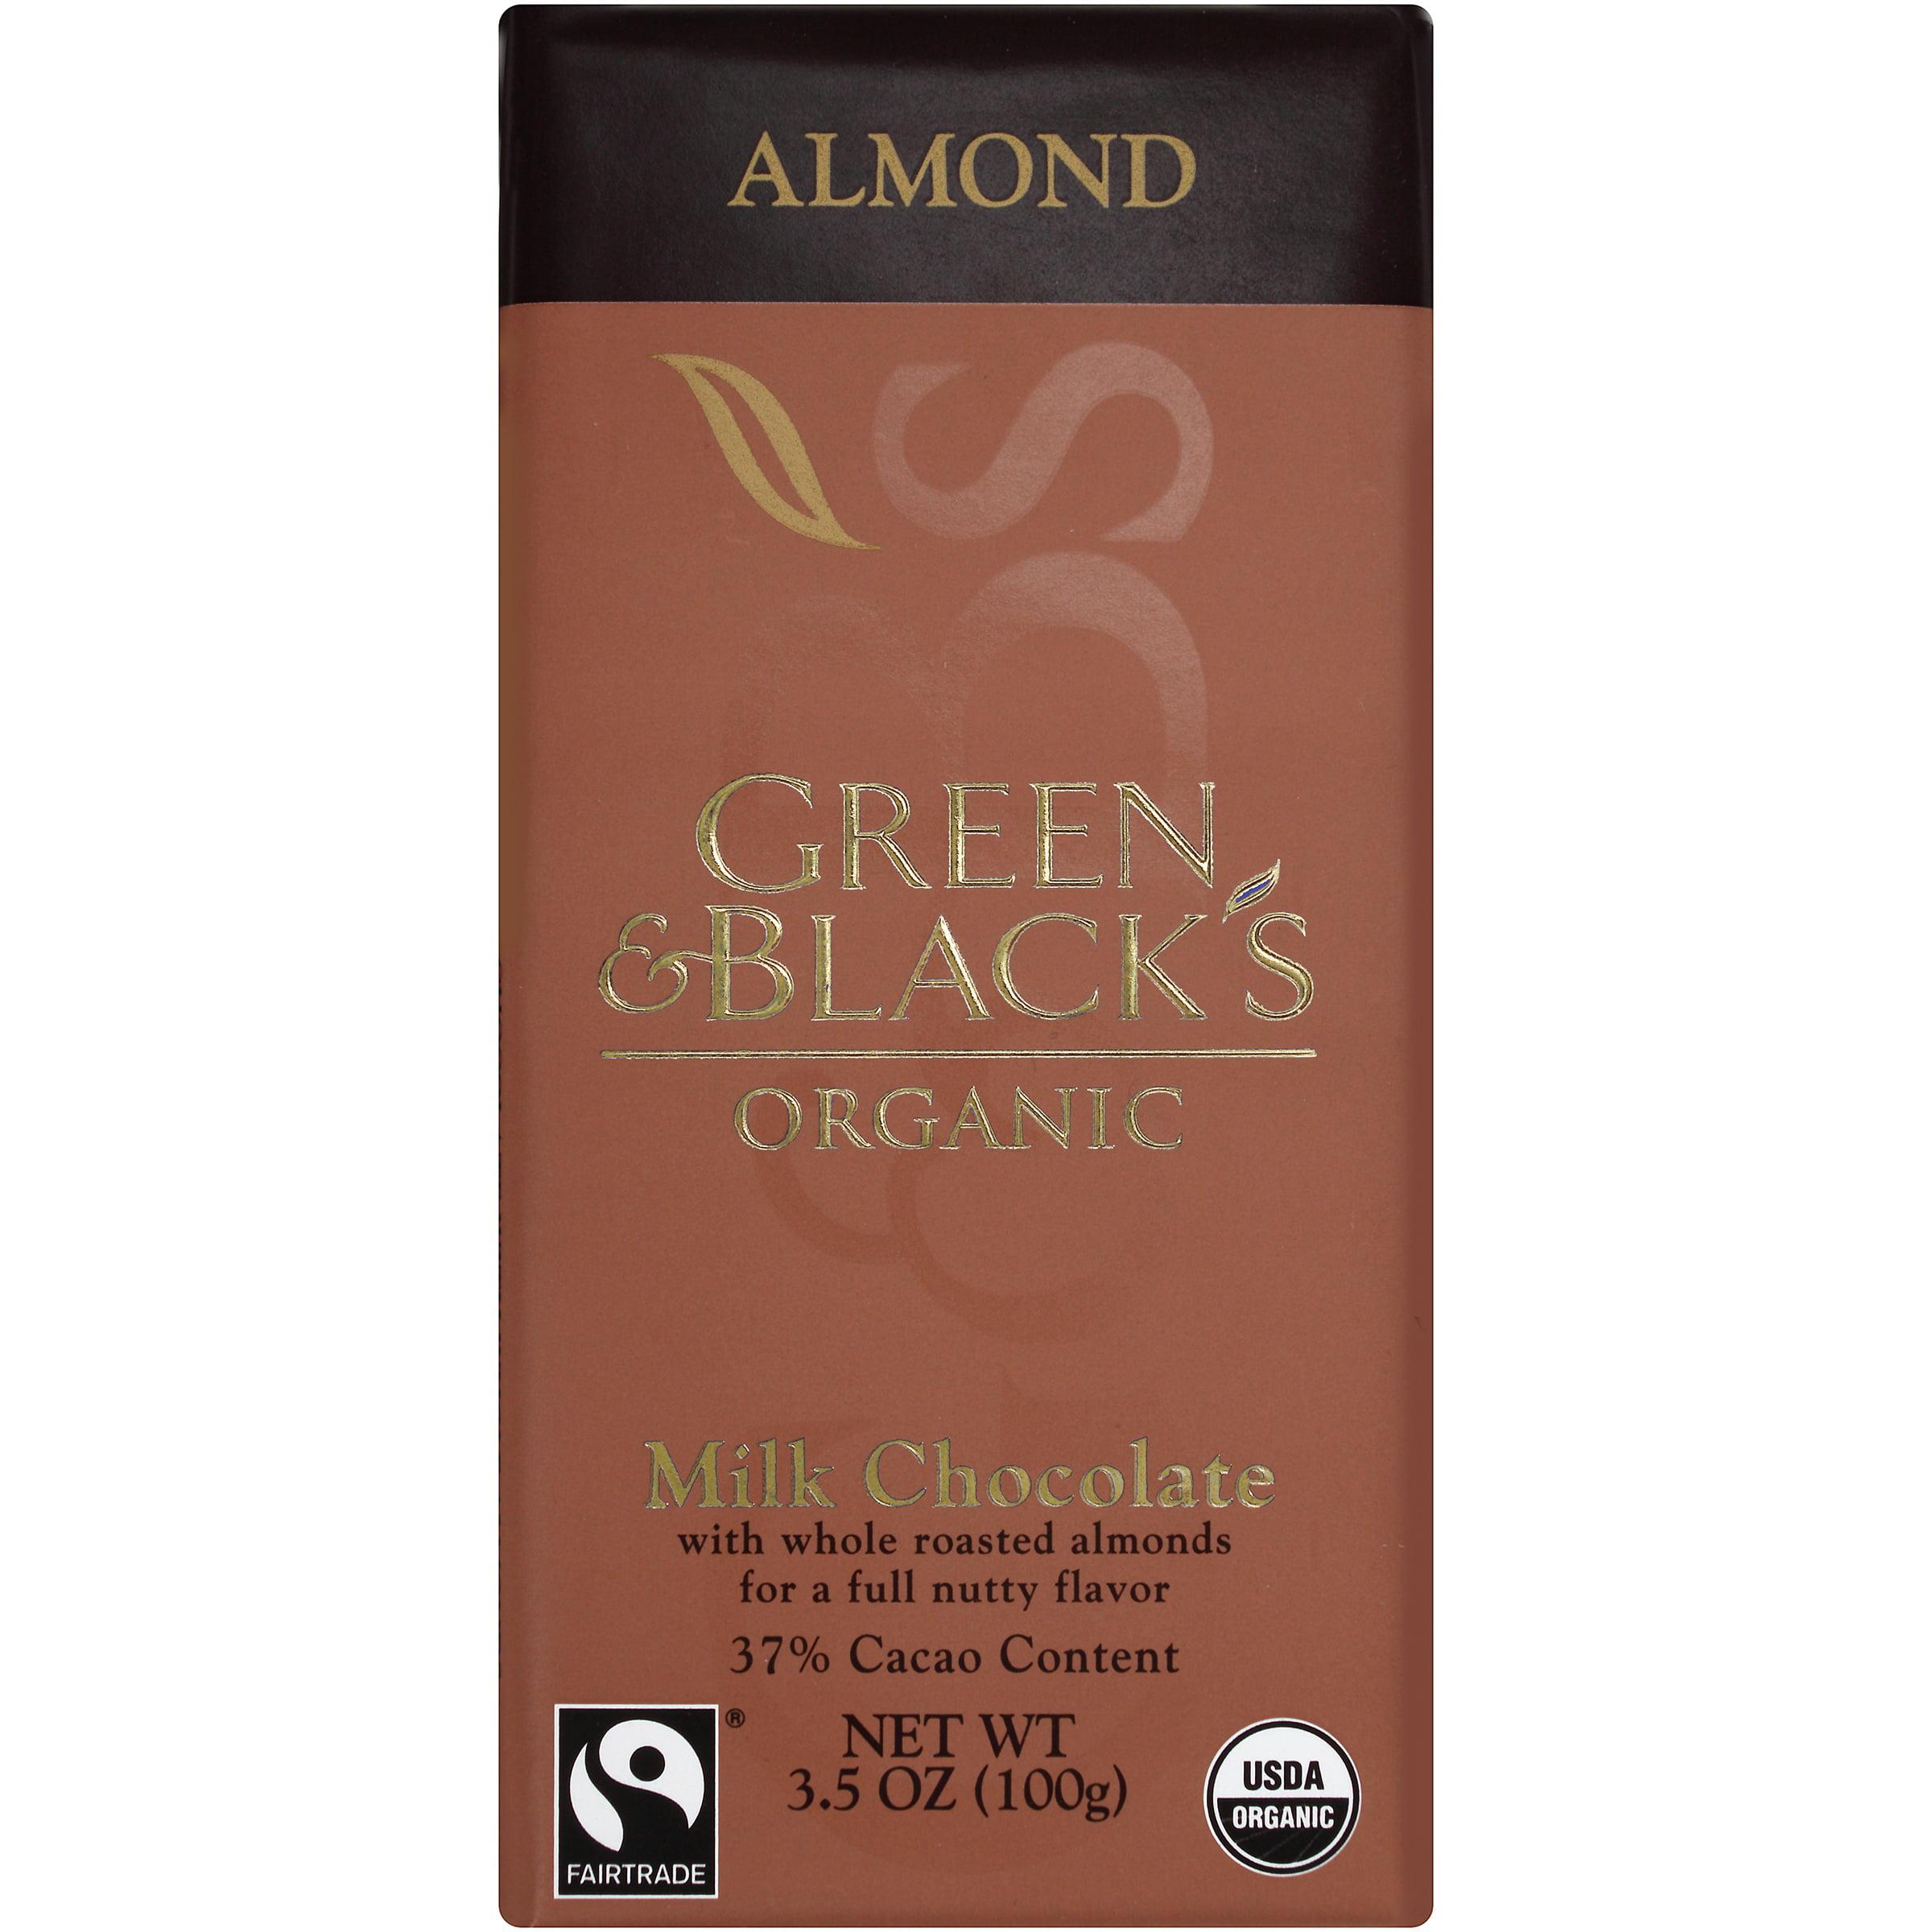 Mondelez Global Llc Green & Black's Organic Milk Chocolate Almond, 3.5 Oz